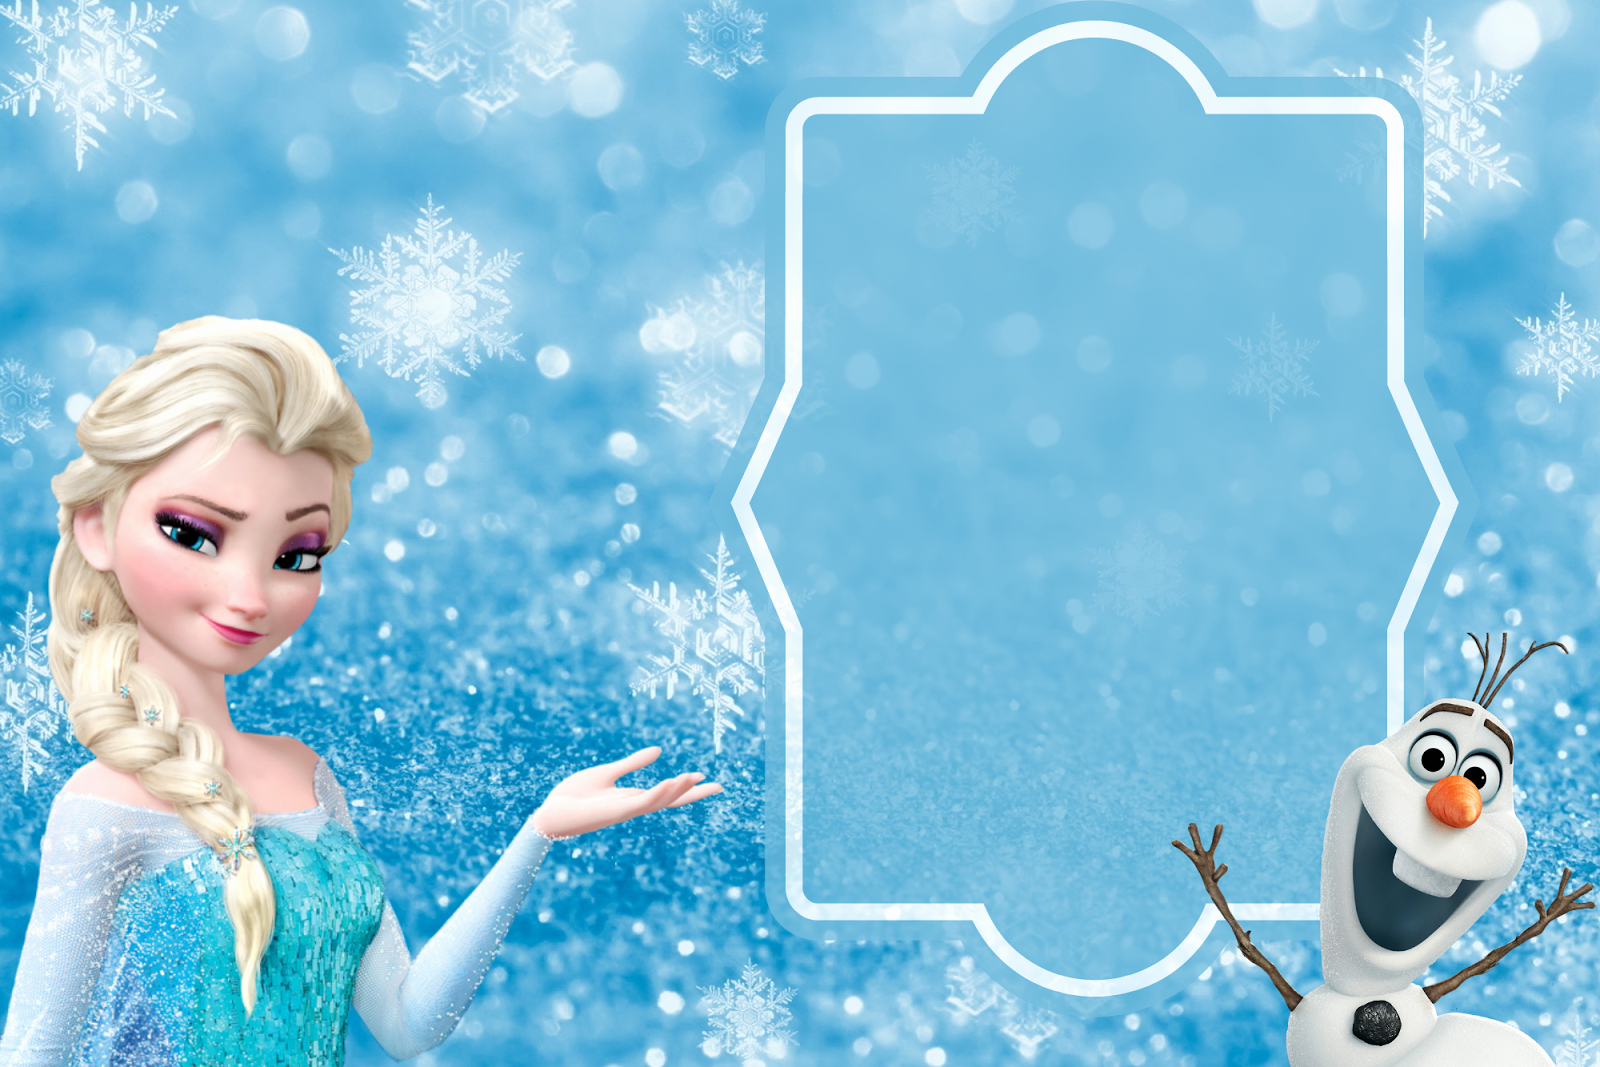 Frozen Birthday Invitation Template Luxury orchard Girls Free Frozen Birthday Party Invitations and